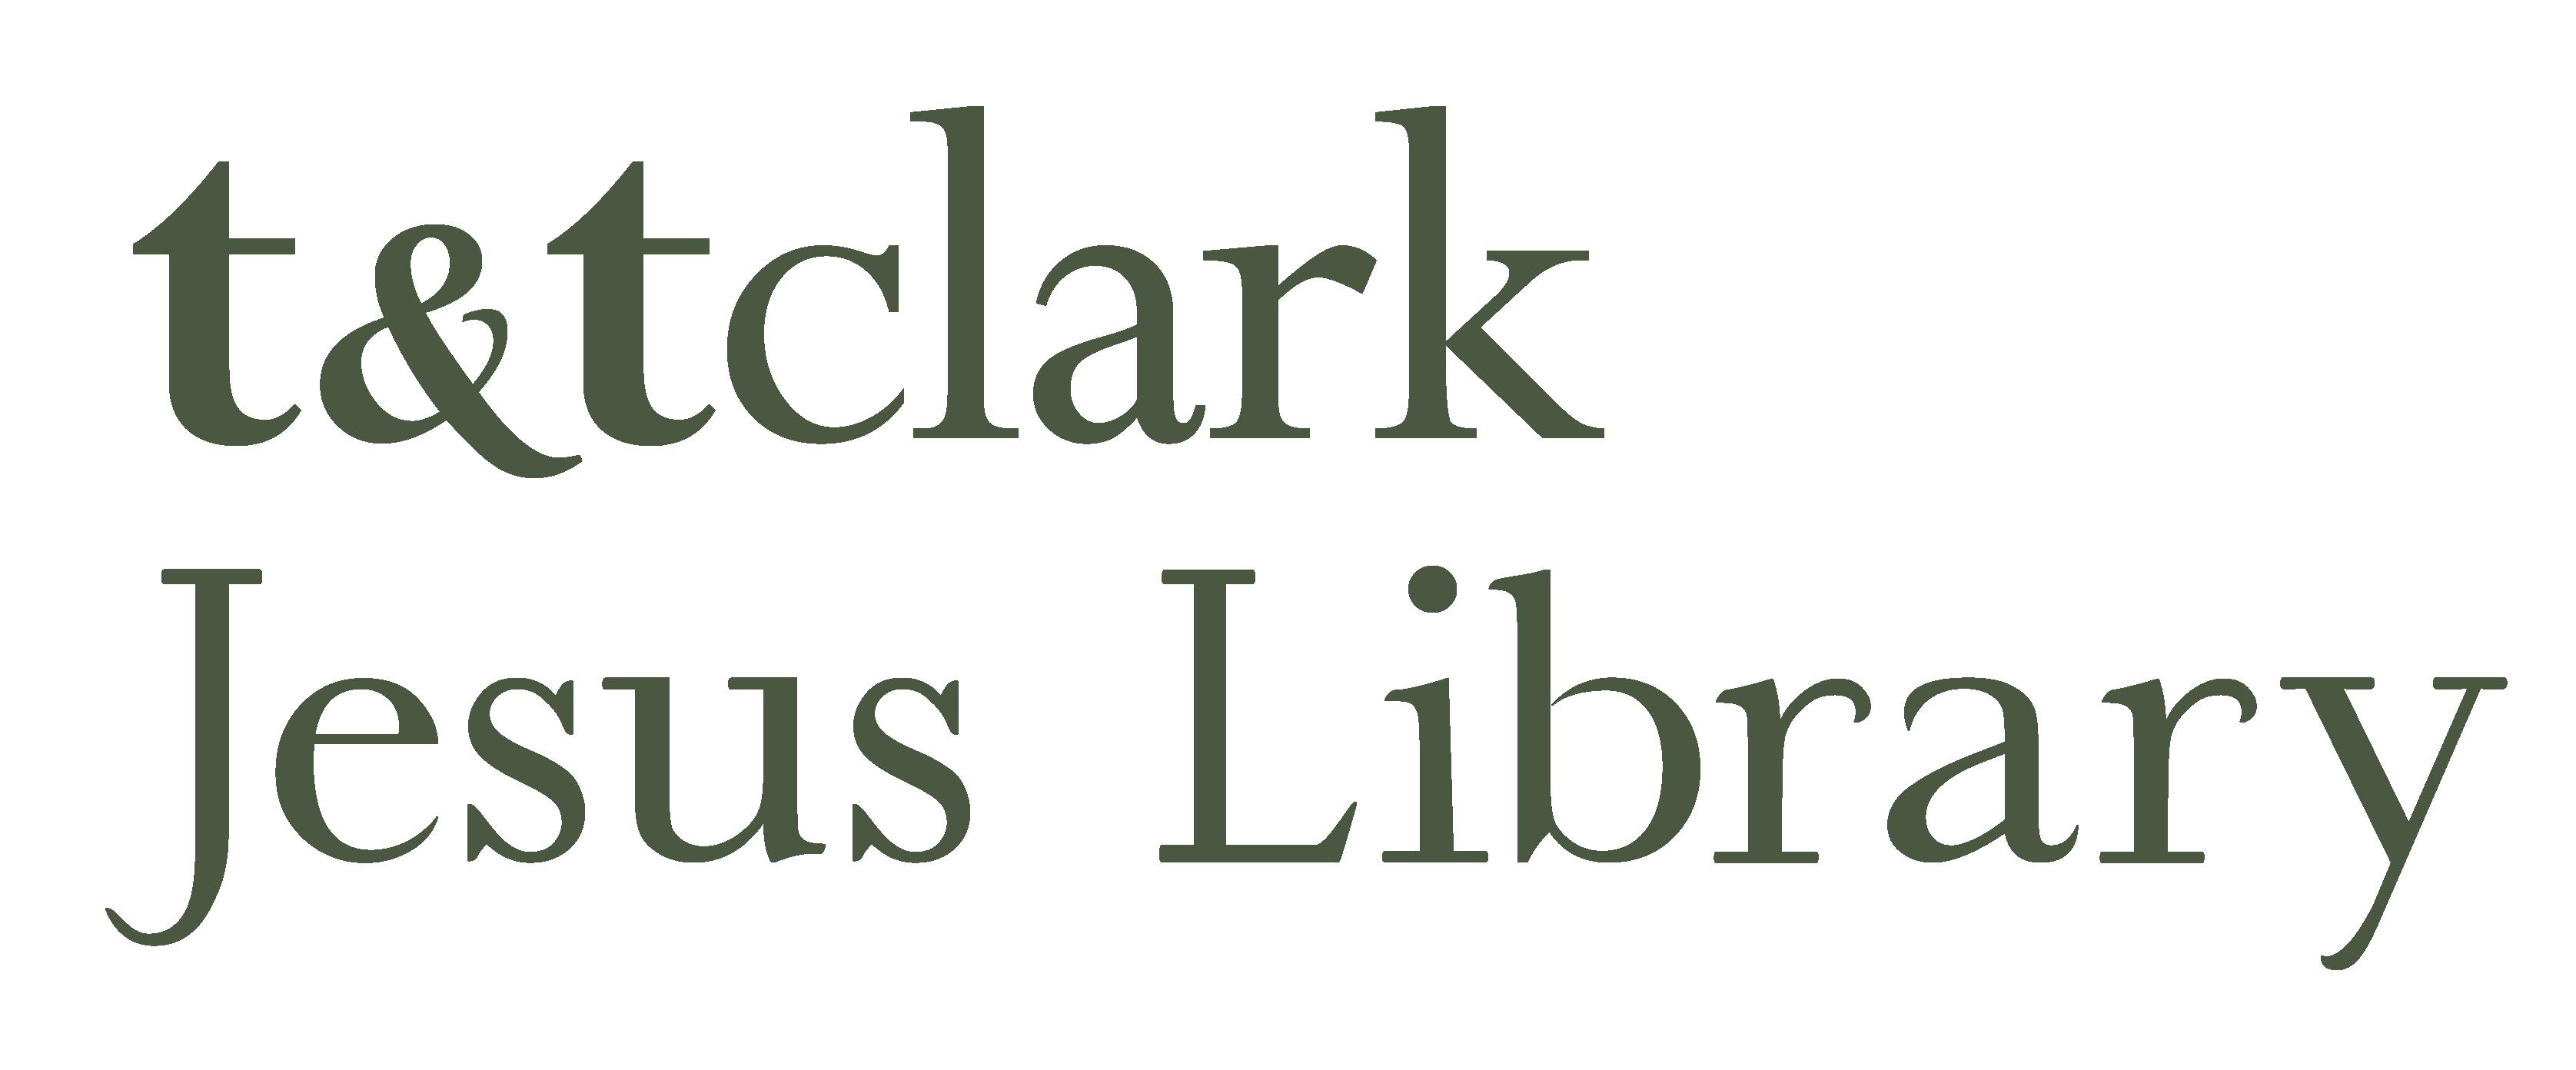 T&T Clark Jesus Library logo